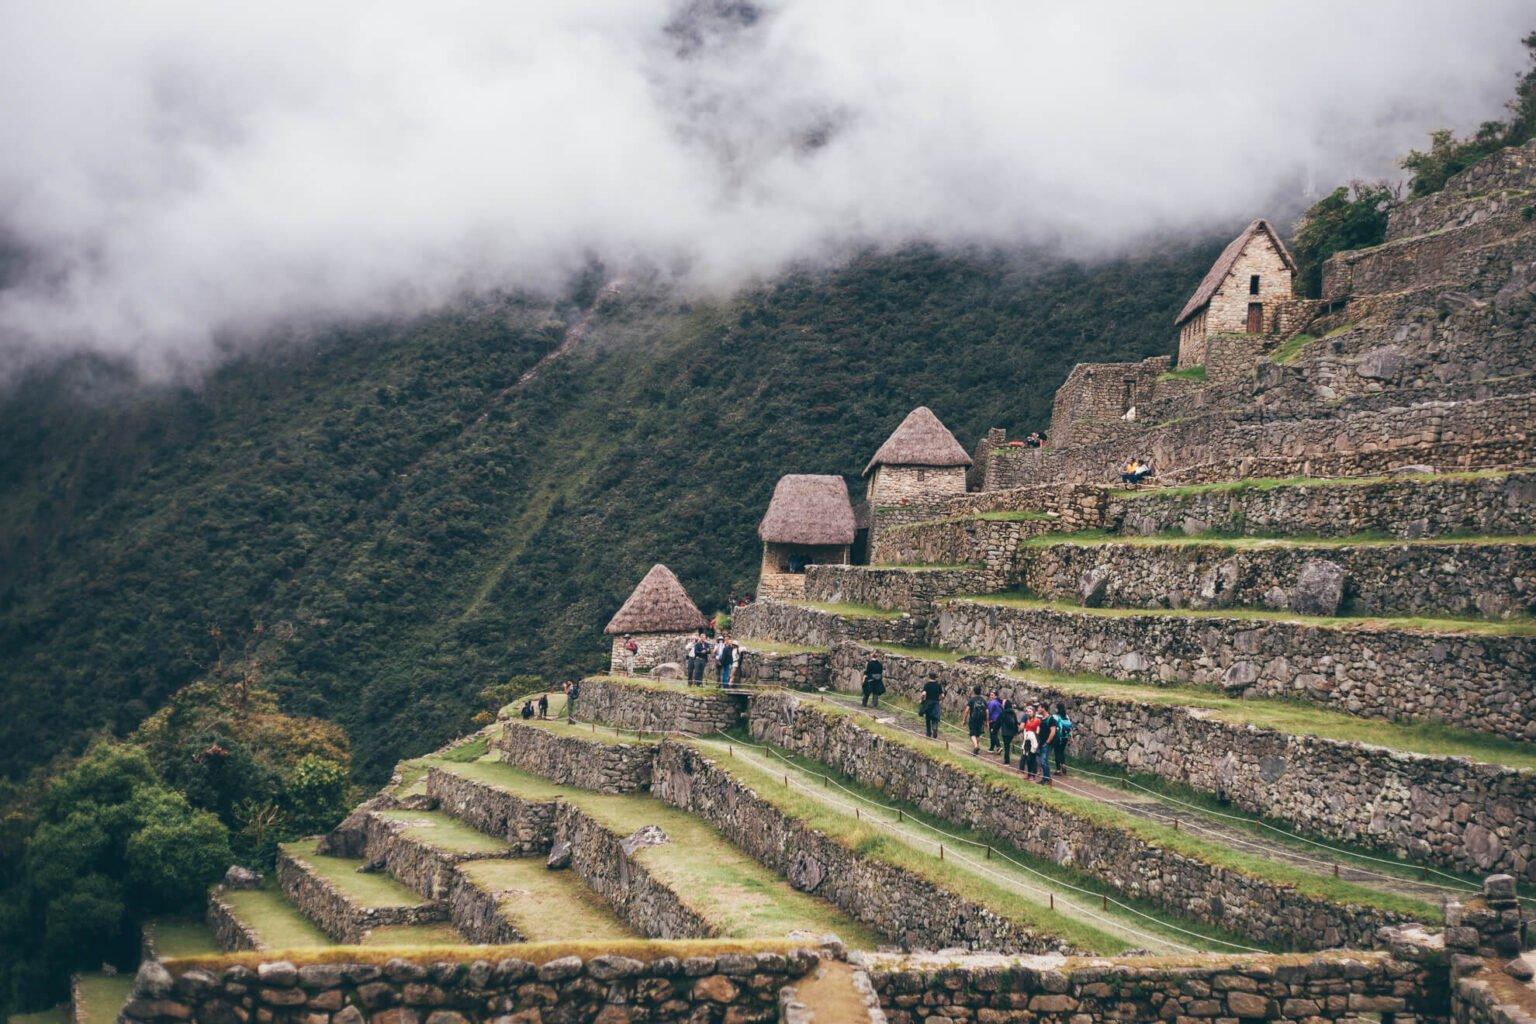 Turistas explorando Machu Picchu